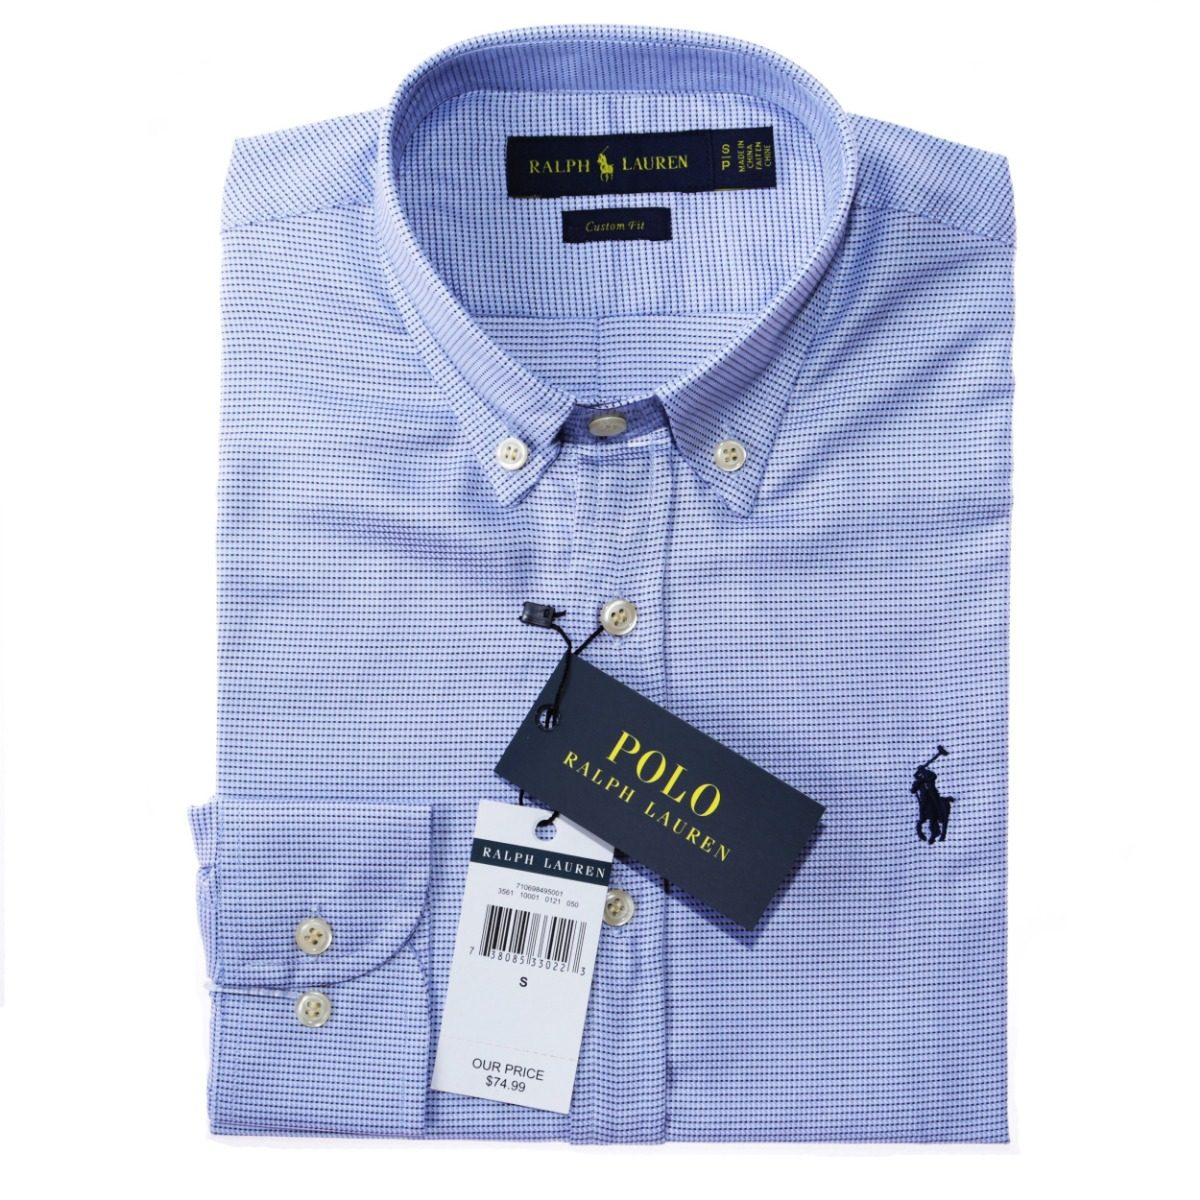 Camisa Social Ralph Lauren Cfit Fio A Fio Azul Masc Original - R ... 96f2236dae82d